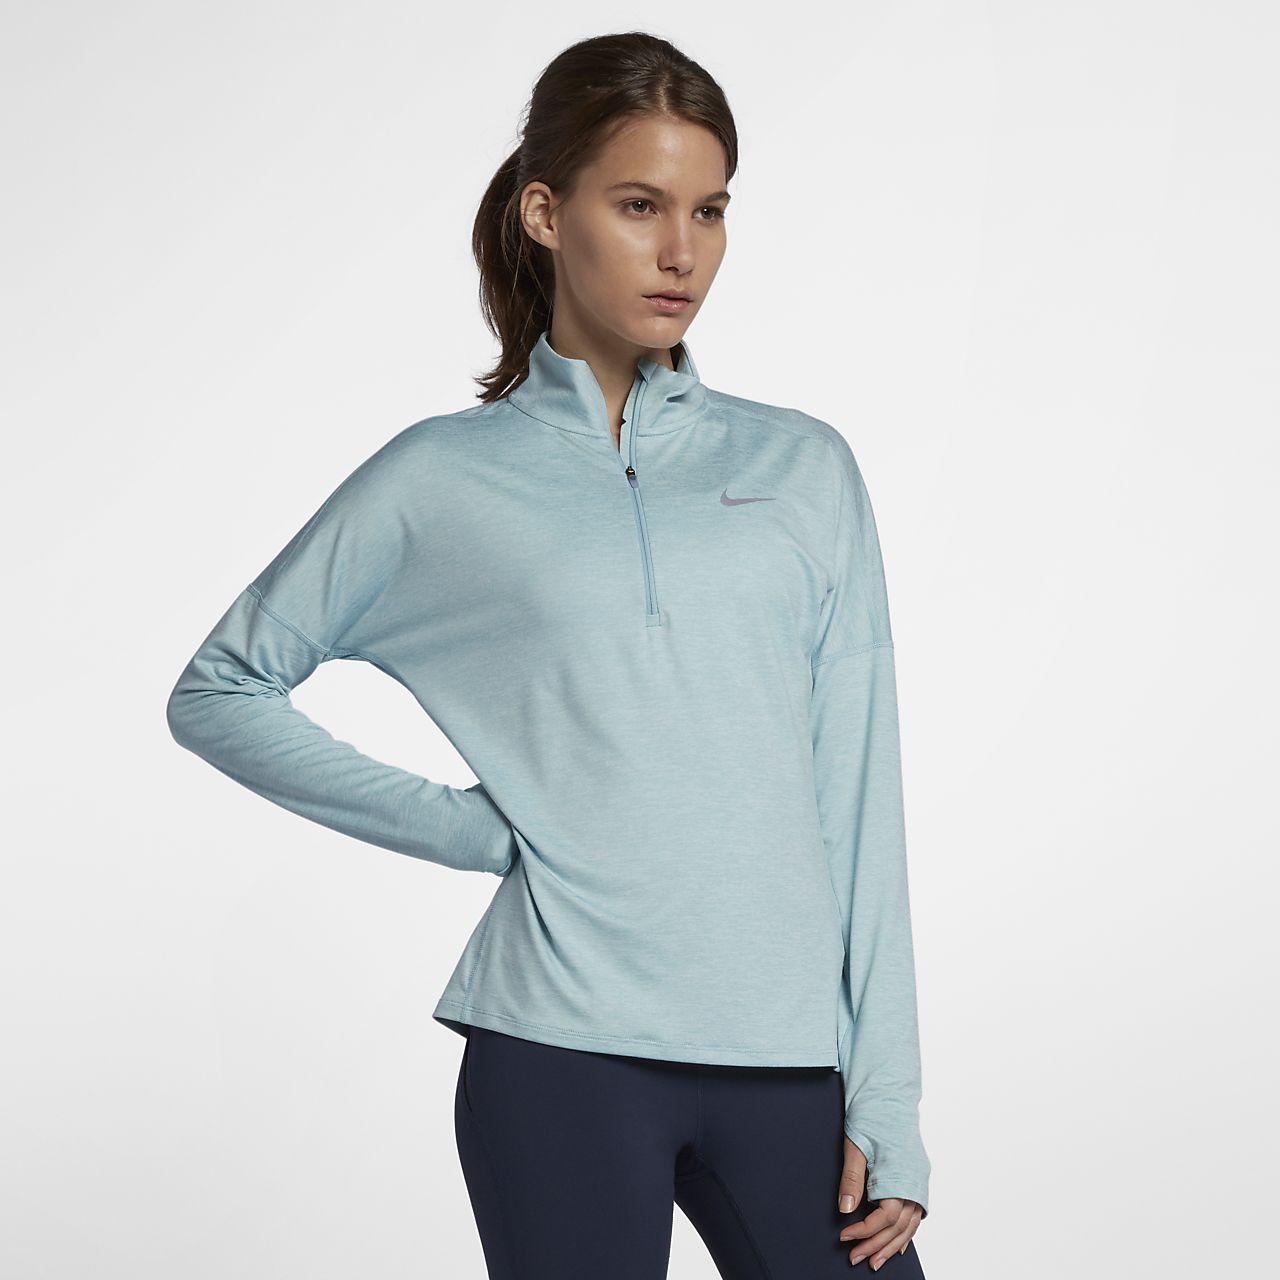 ce5f612b5ea4 Nike Dri-FIT Women s Long-Sleeve Running Half-Zip Top. Nike.com GB